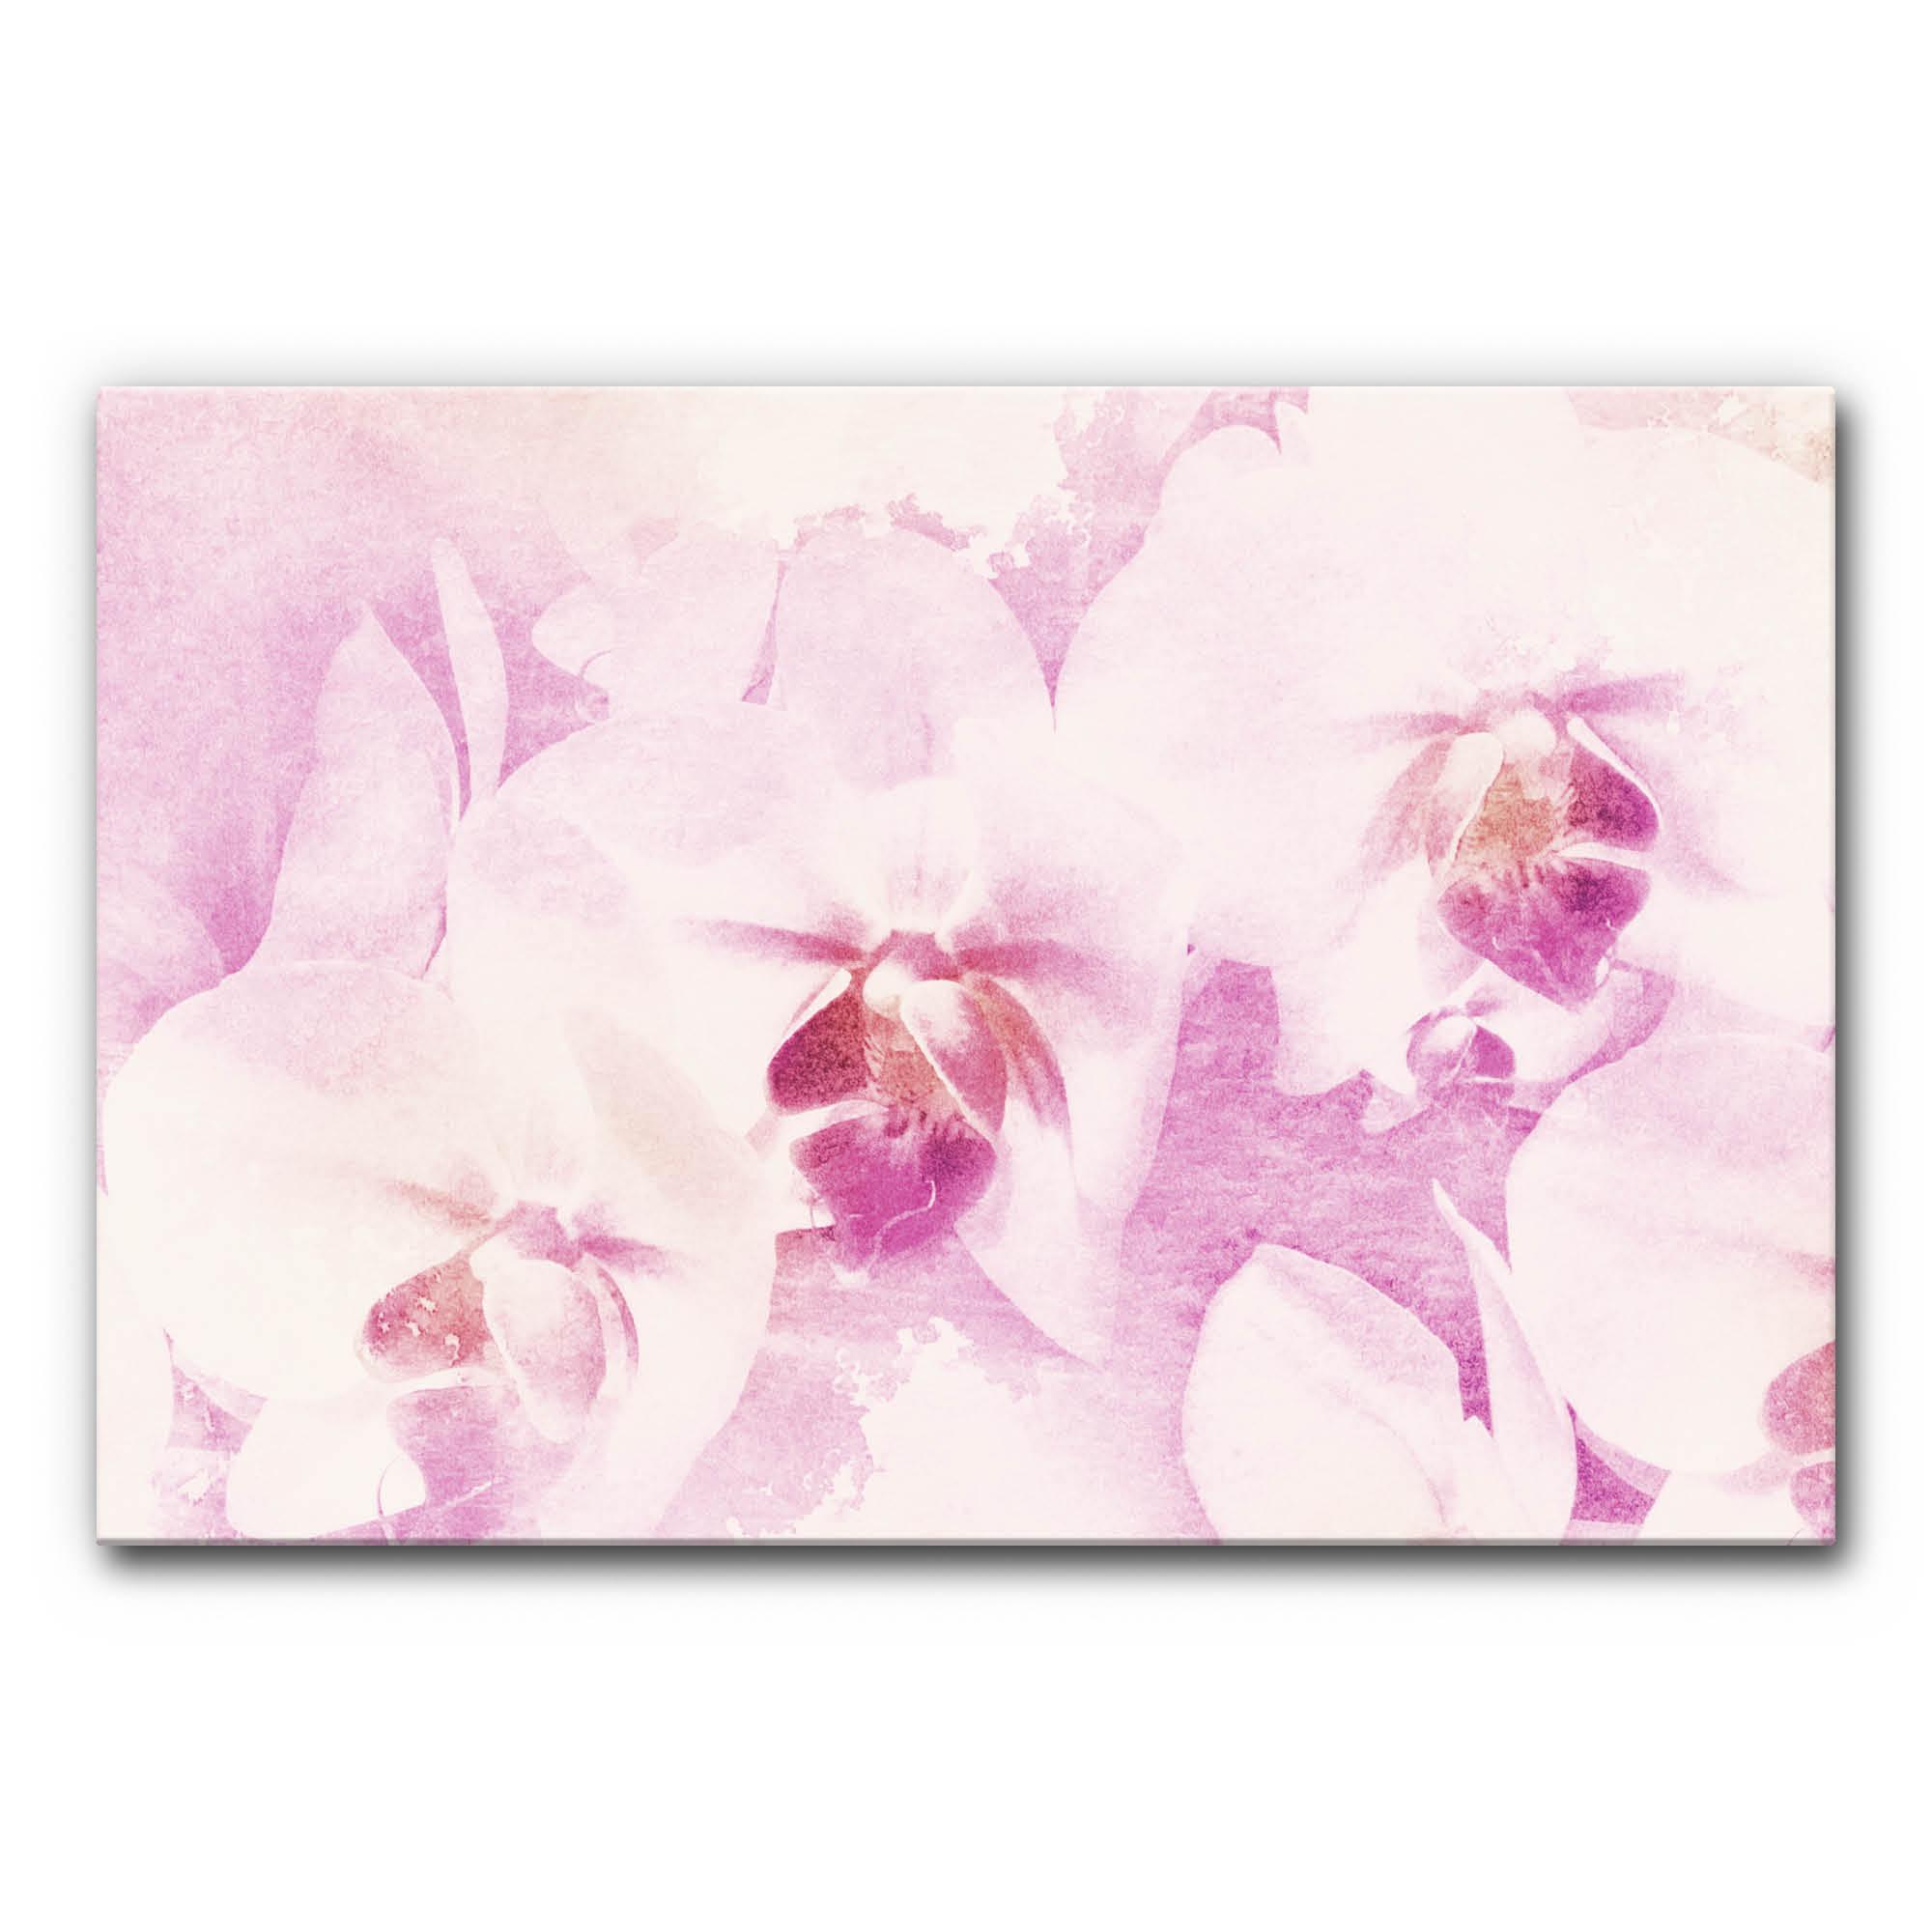 Schallabsorber Akustikbild Orchidee im Format 1200 x 800 mm